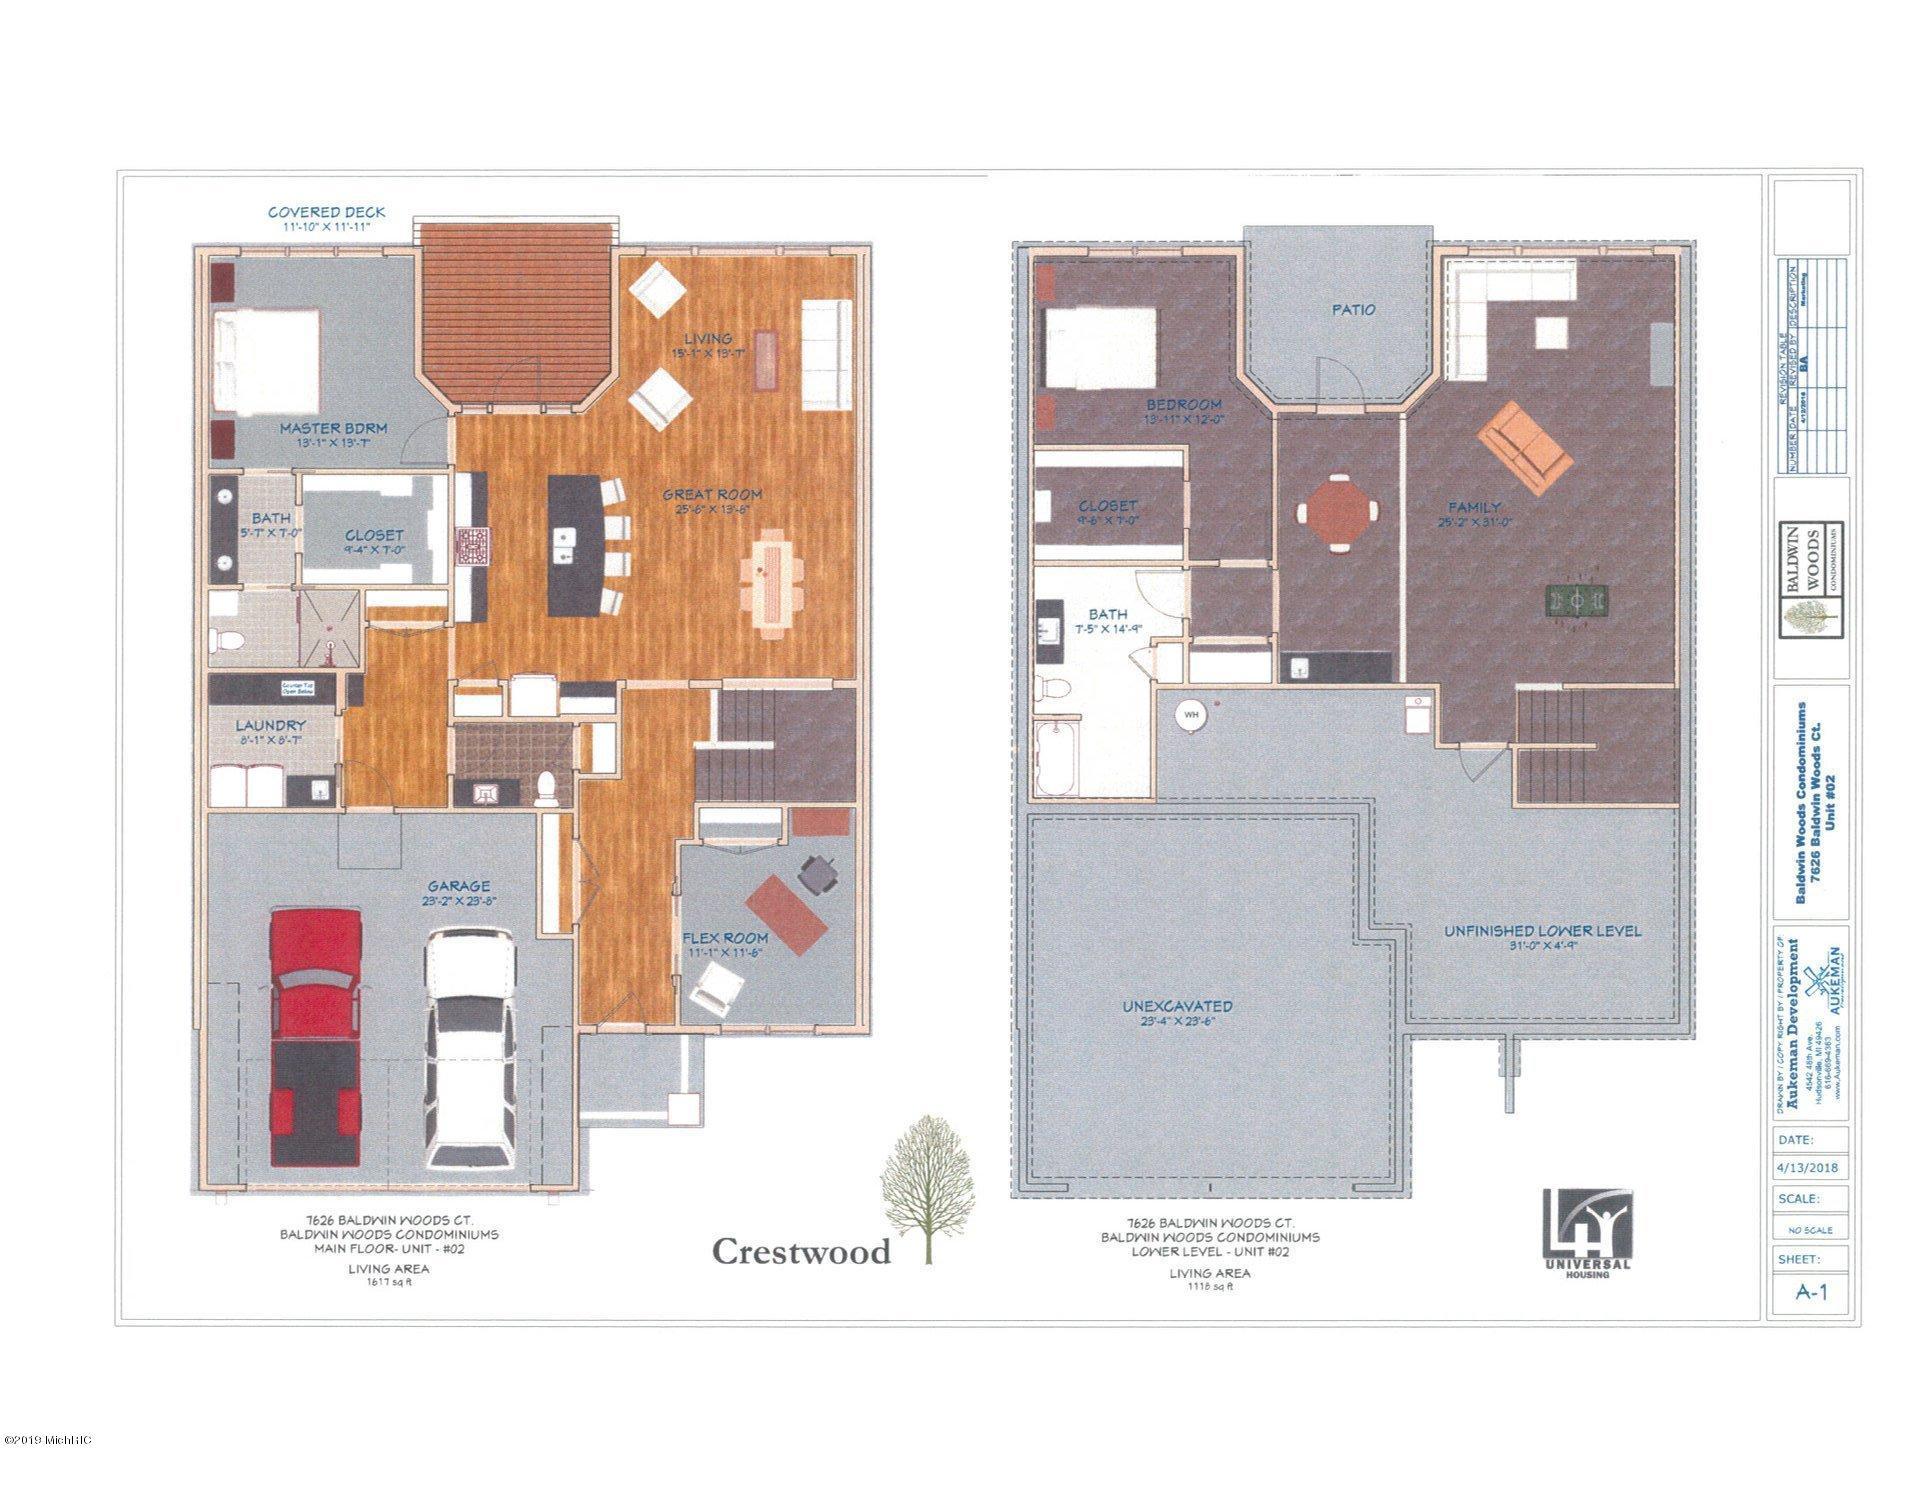 Floor Plan Crestwood